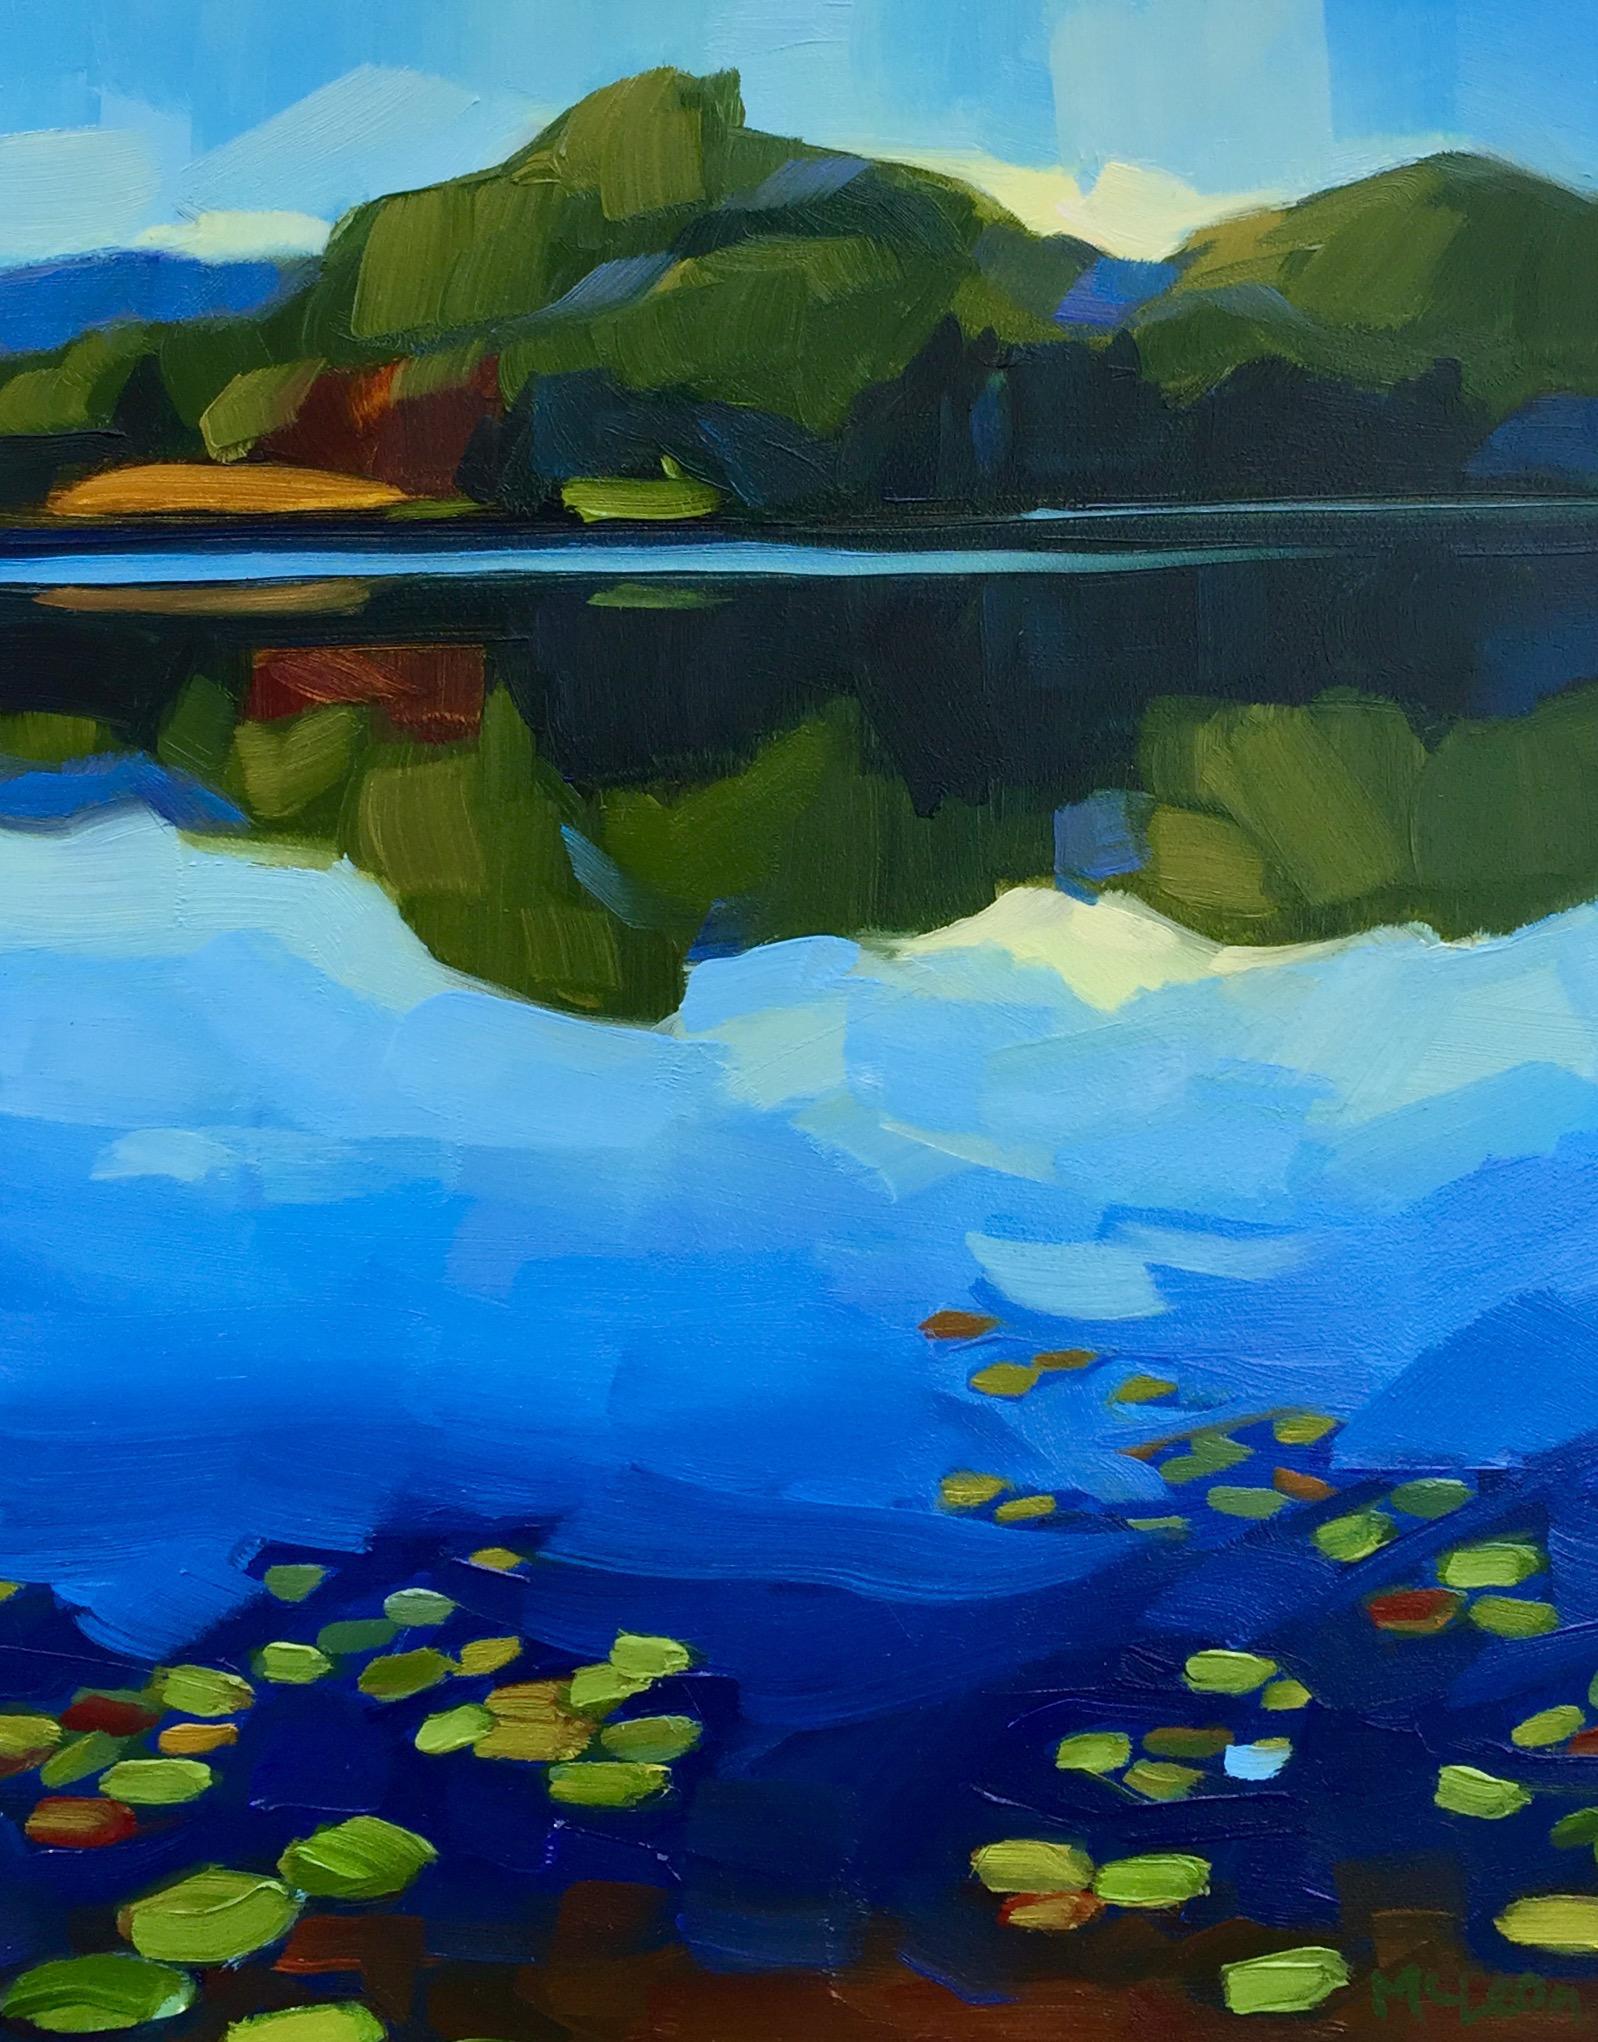 Reflecting on Post Pond